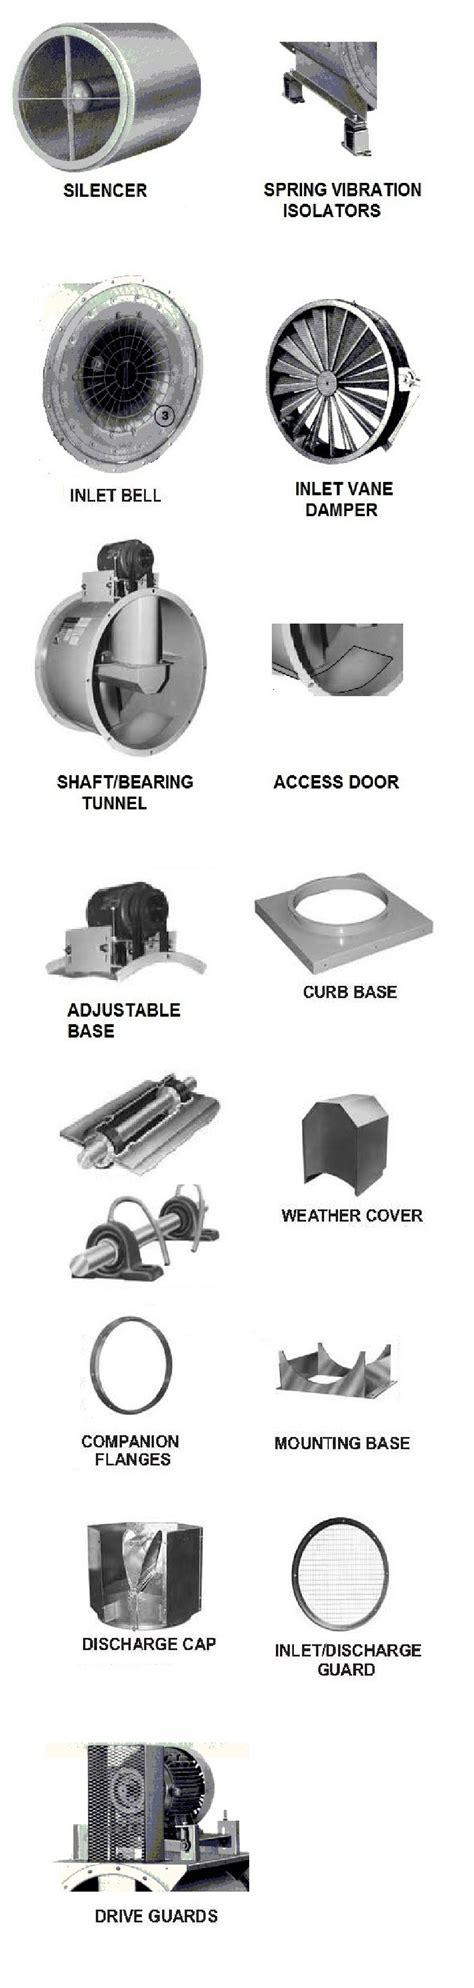 direct drive tubeaxial fans type tedh tubeaxial direct drive duct fan